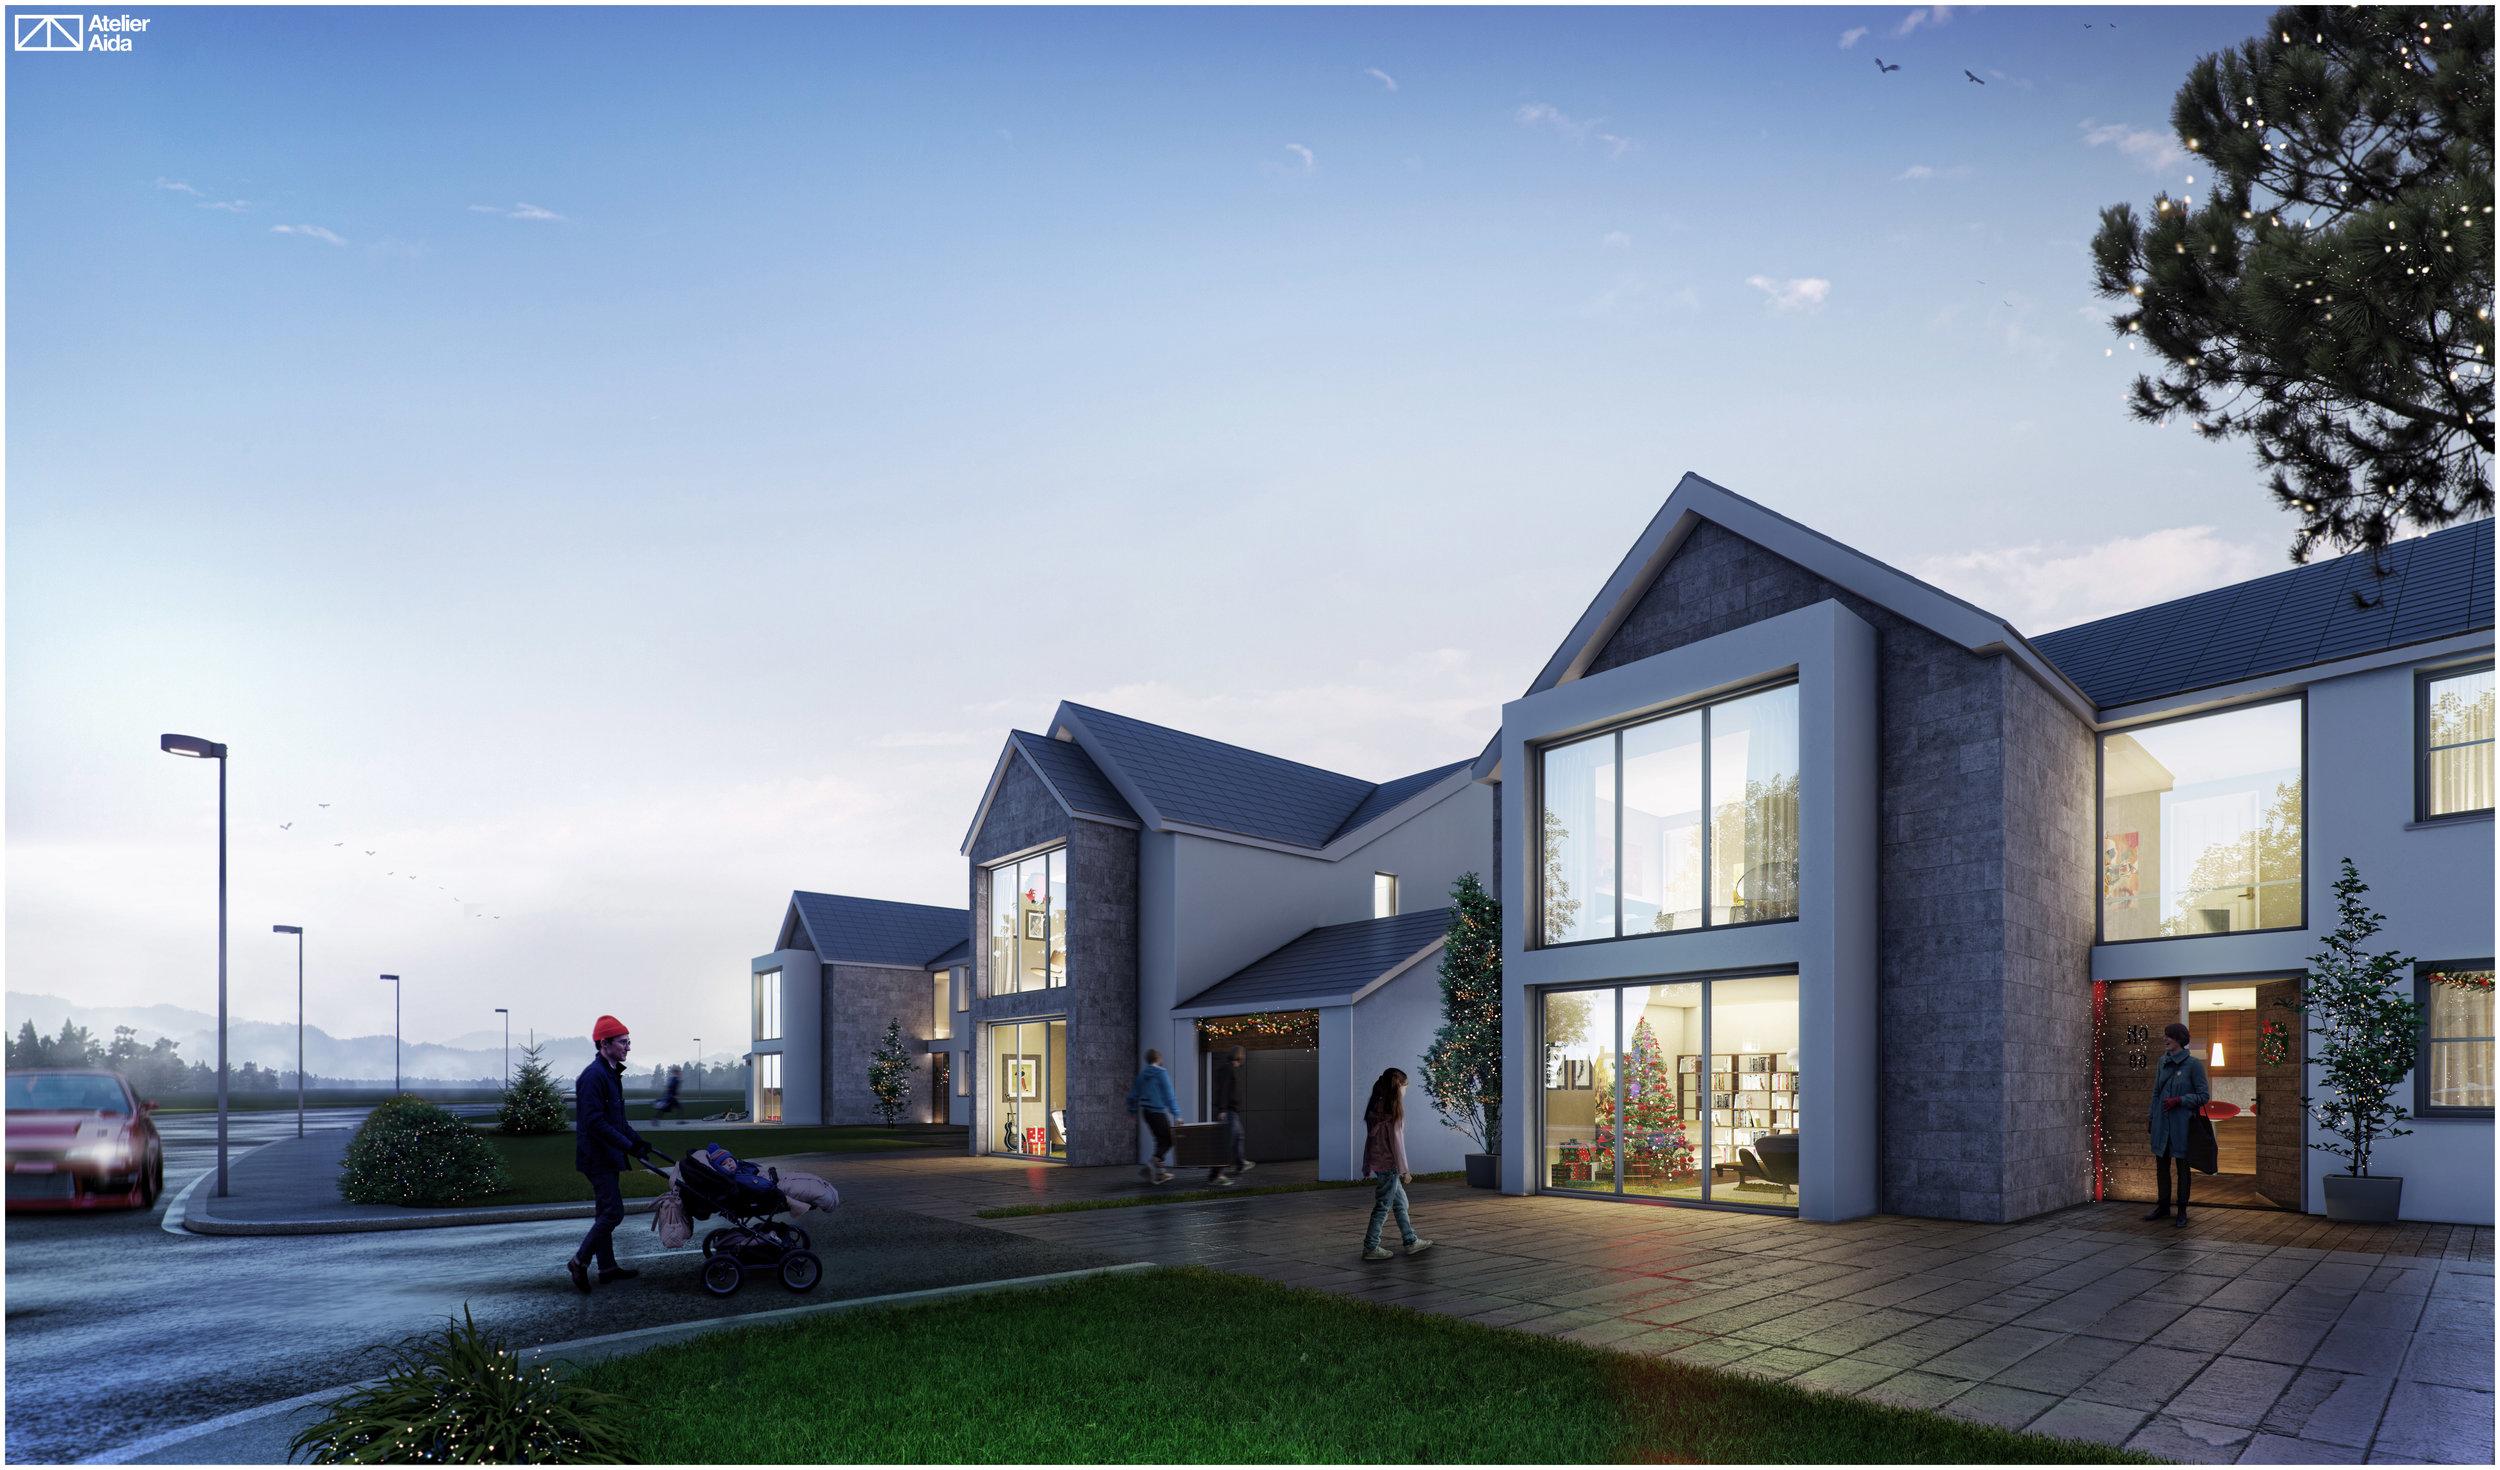 3 new houses old way bishopstone swansea [ 2500 x 1470 Pixel ]